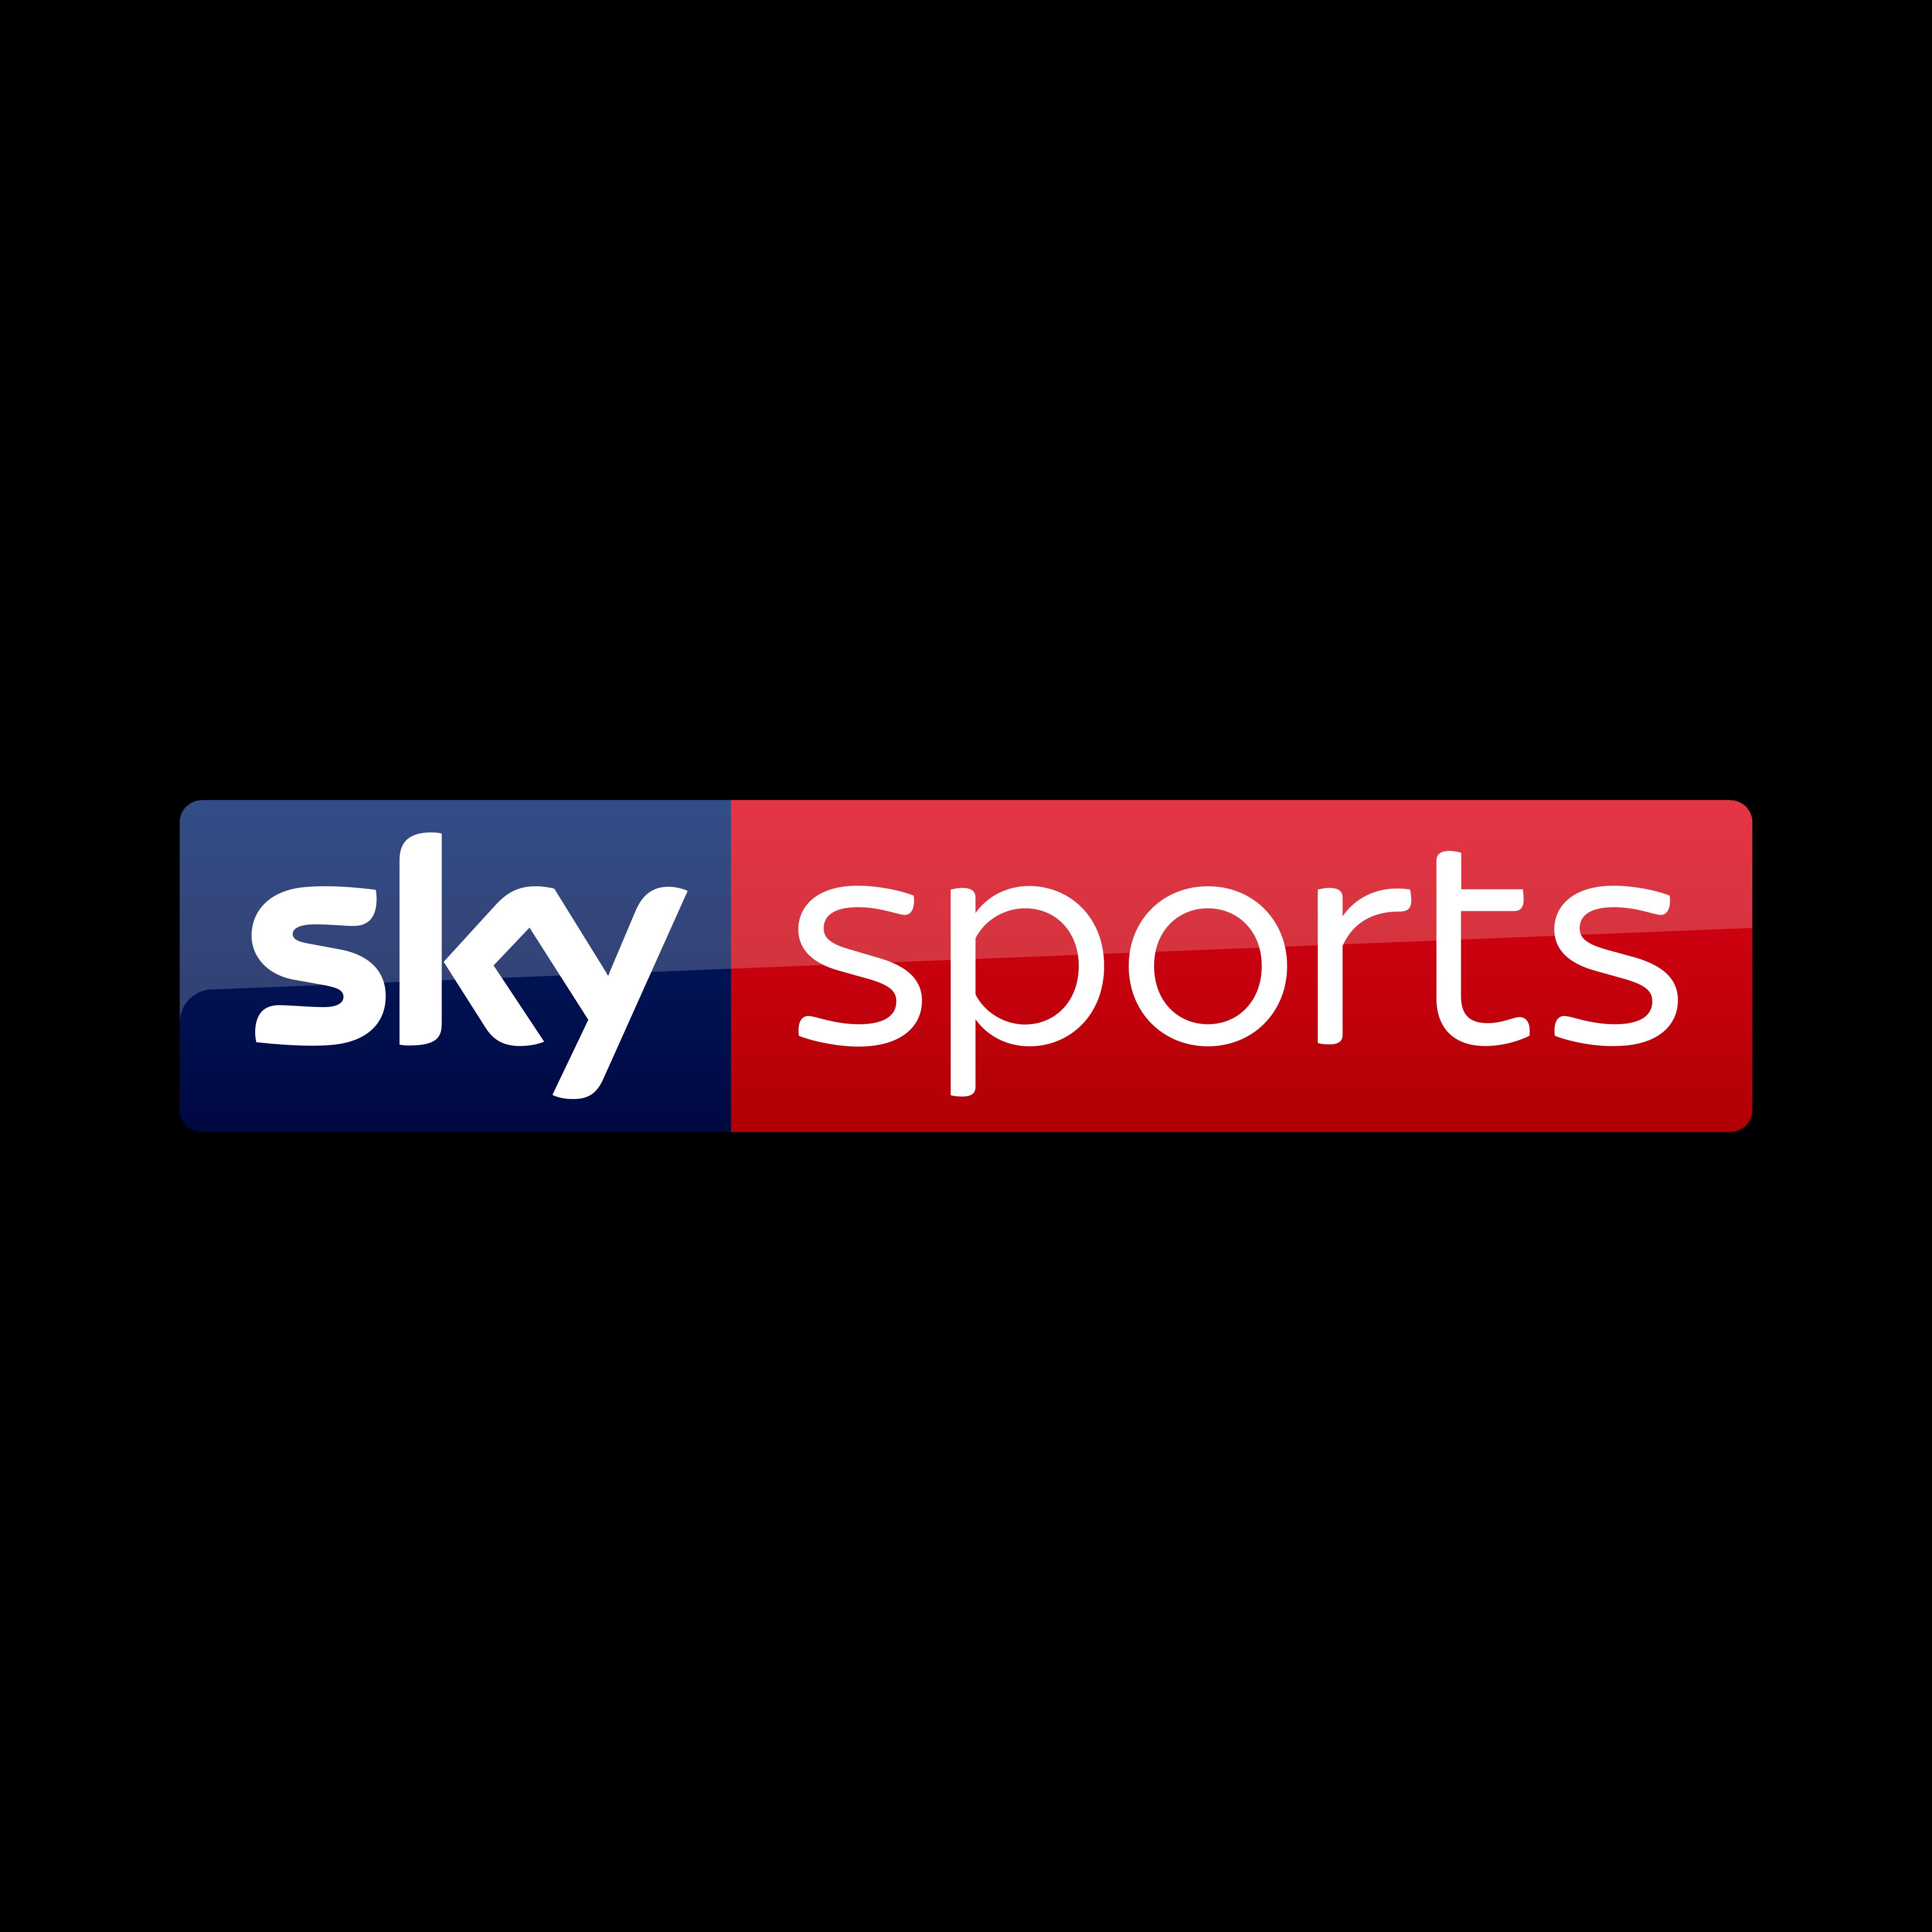 sky sports logo 0 - Sky Sports Logo